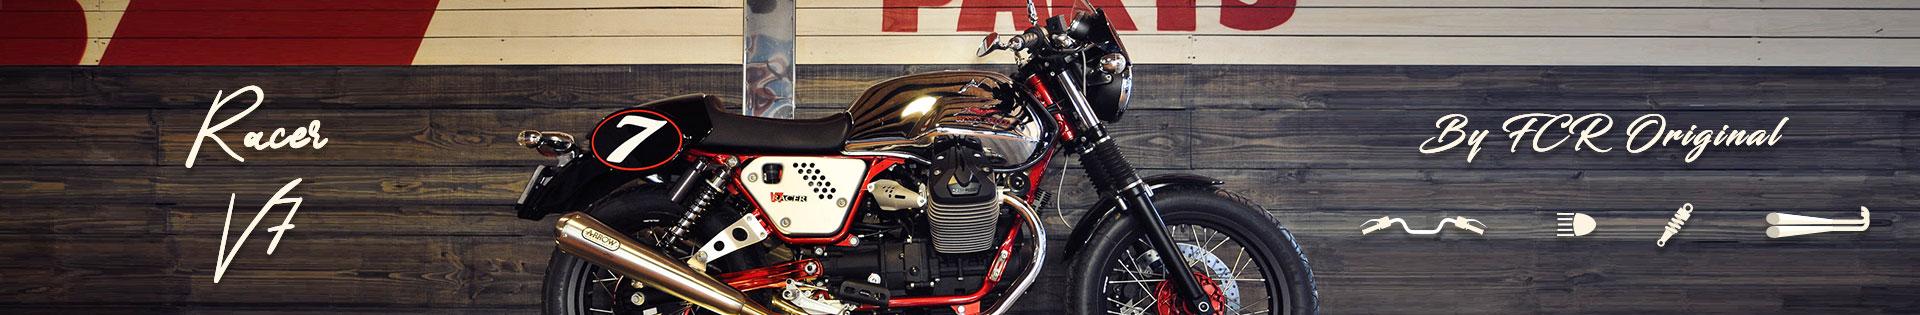 accessoires moto custom cafe racer moto guzzi